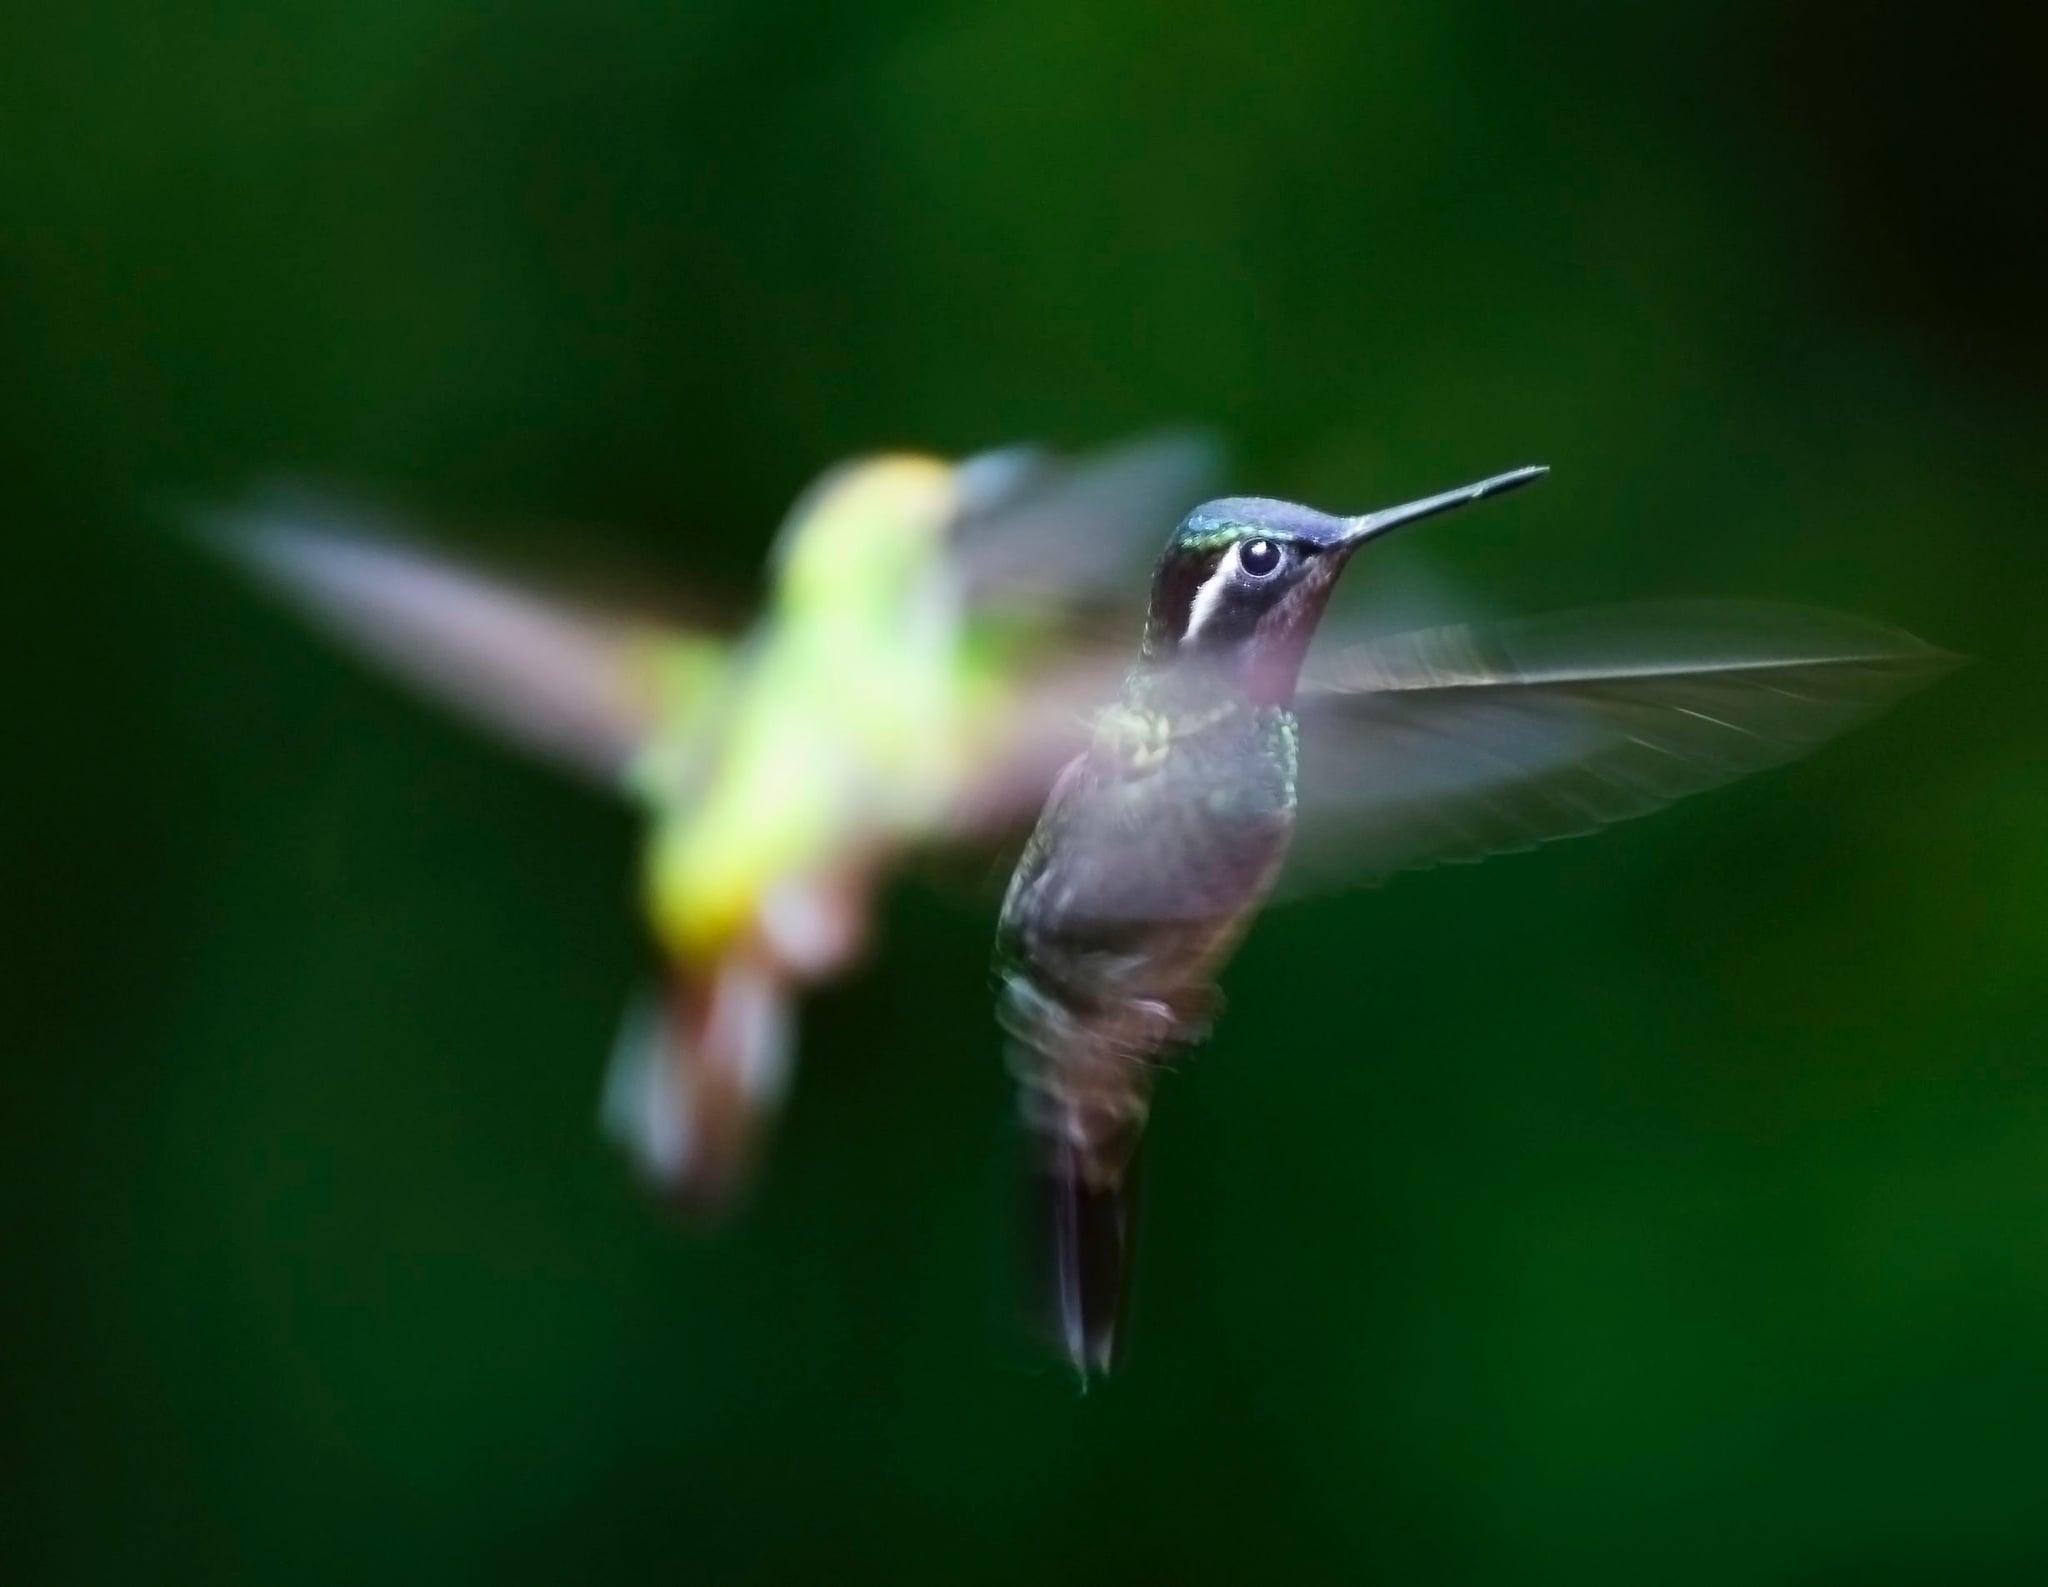 Hummingbird food recipe popsugar home simple hummingbird nectar recipe forumfinder Gallery